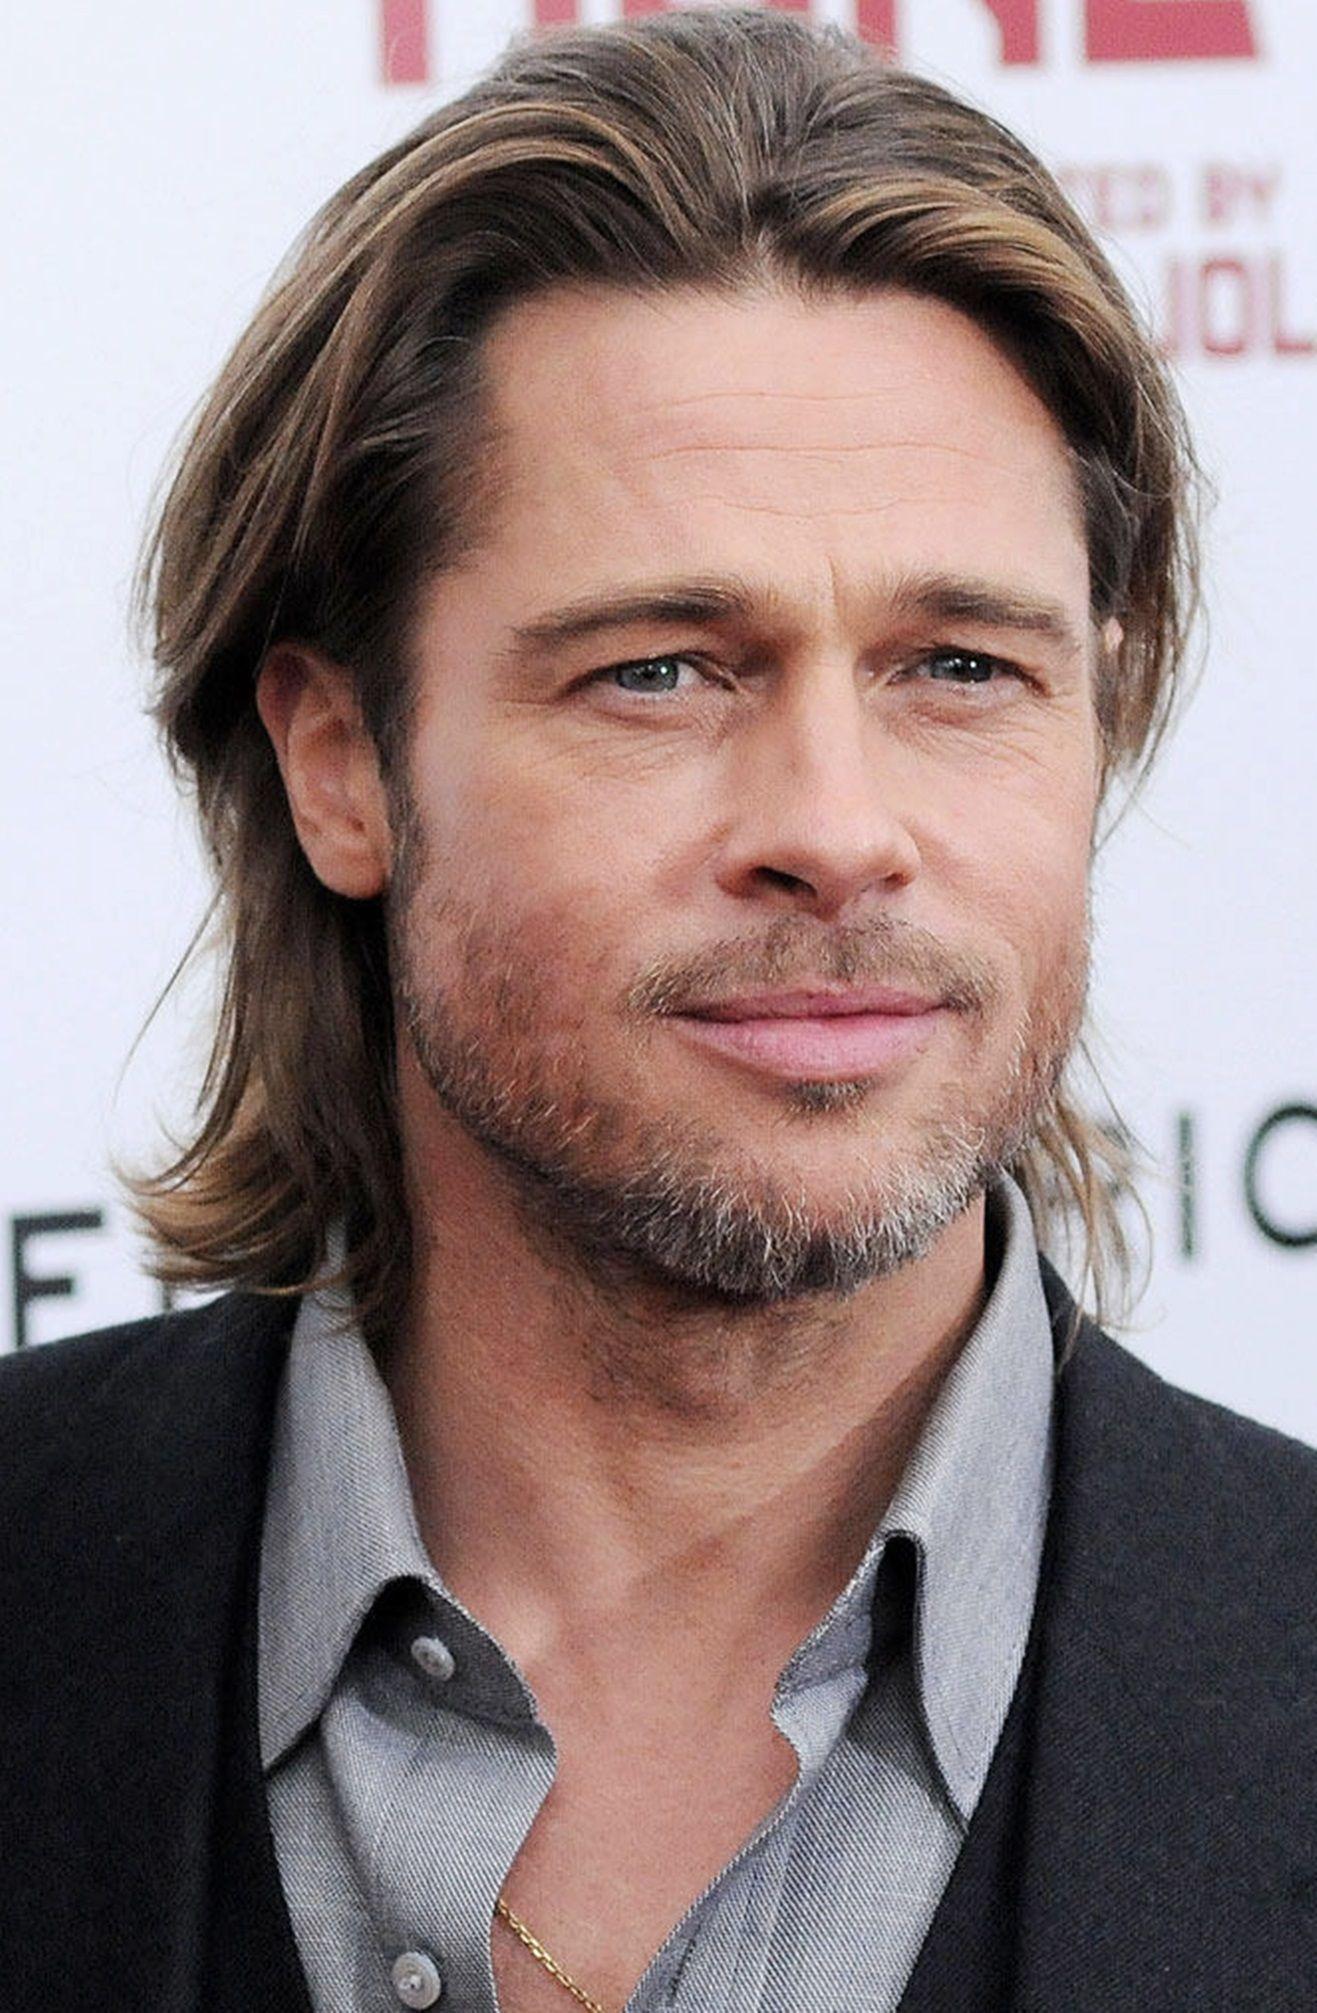 Brad Pitt With Long Hair Brad Pitt Brad And Angelina Long Hair Styles Men